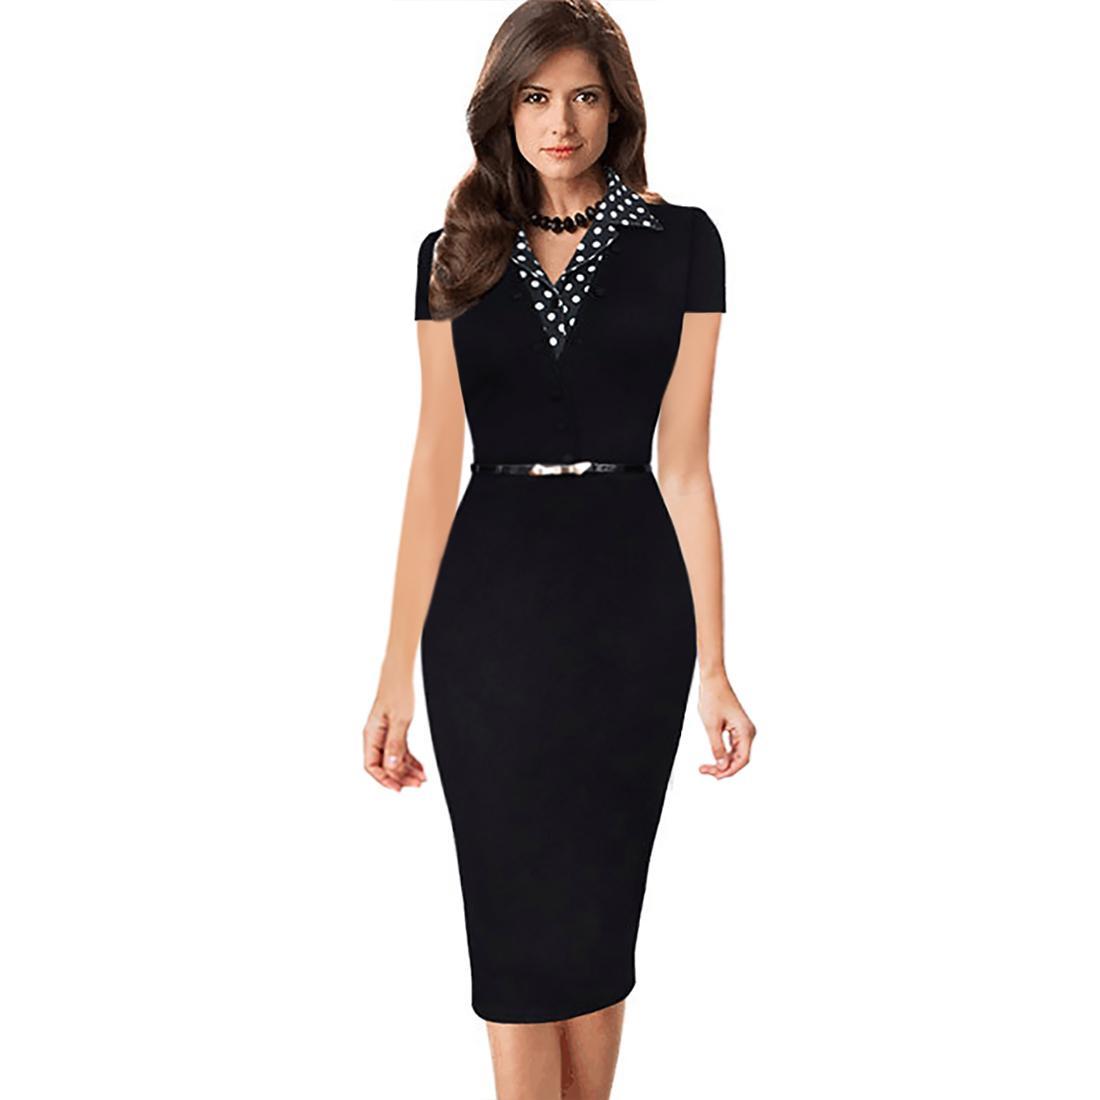 f6ccb53ea72 Elegant Fitted Summer Dress Women Short Sleeve Dot Turn-down Collar Button  Wear to Work Office Business Formal Sheath Pencil Dress With Belt Pencil  Dress ...